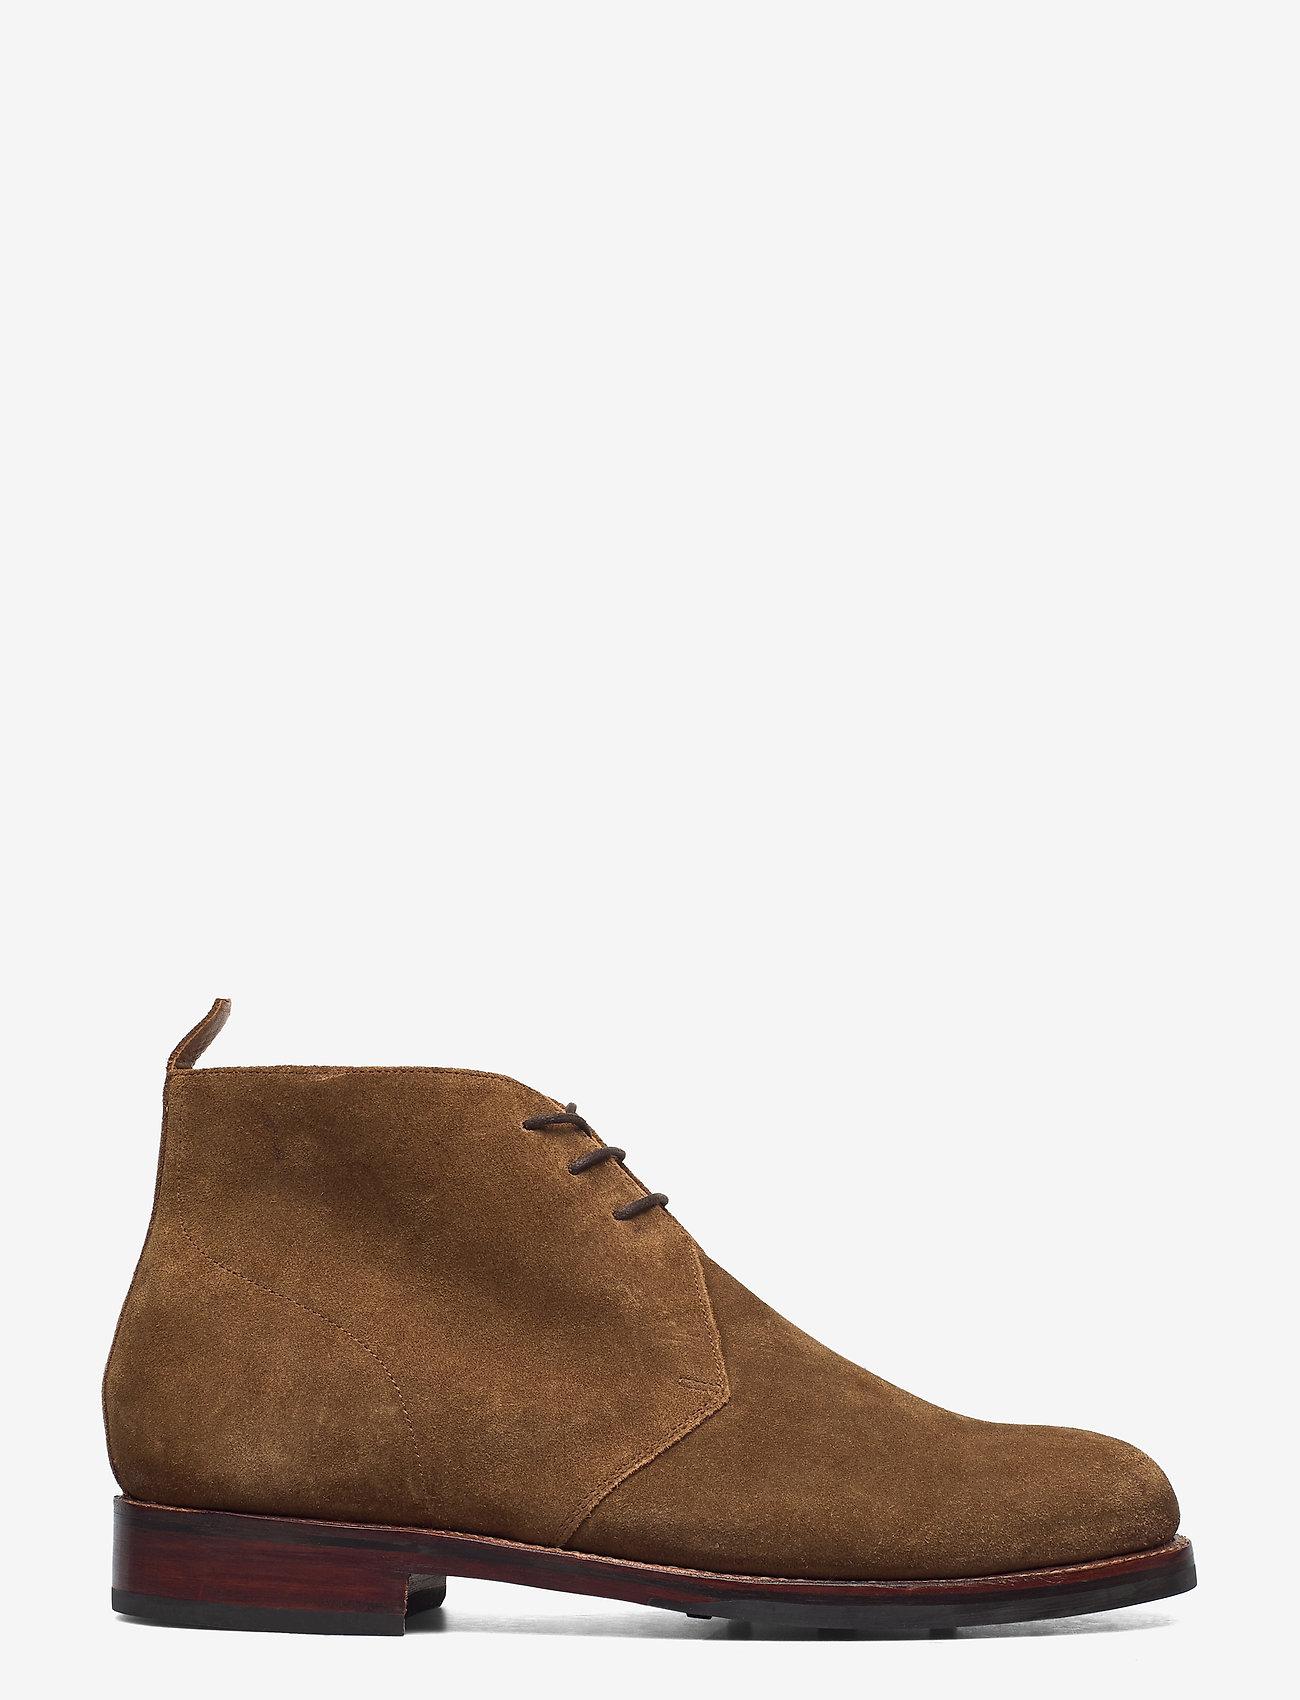 Grenson - WENDELL - desert boots - snuff - 1